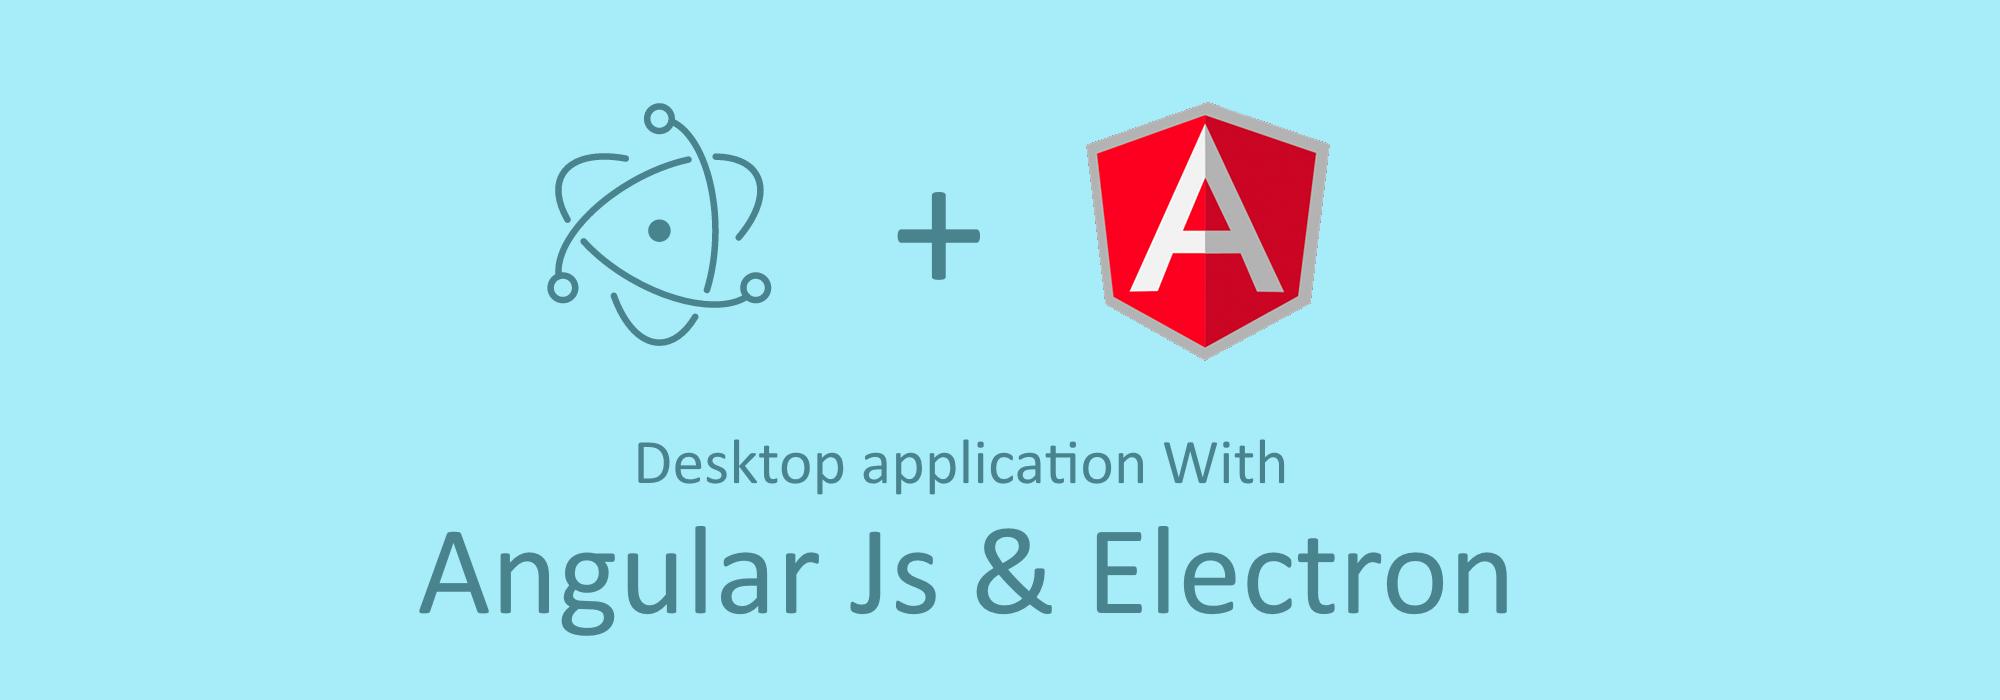 Creating Desktop Applications With AngularJS and GitHub